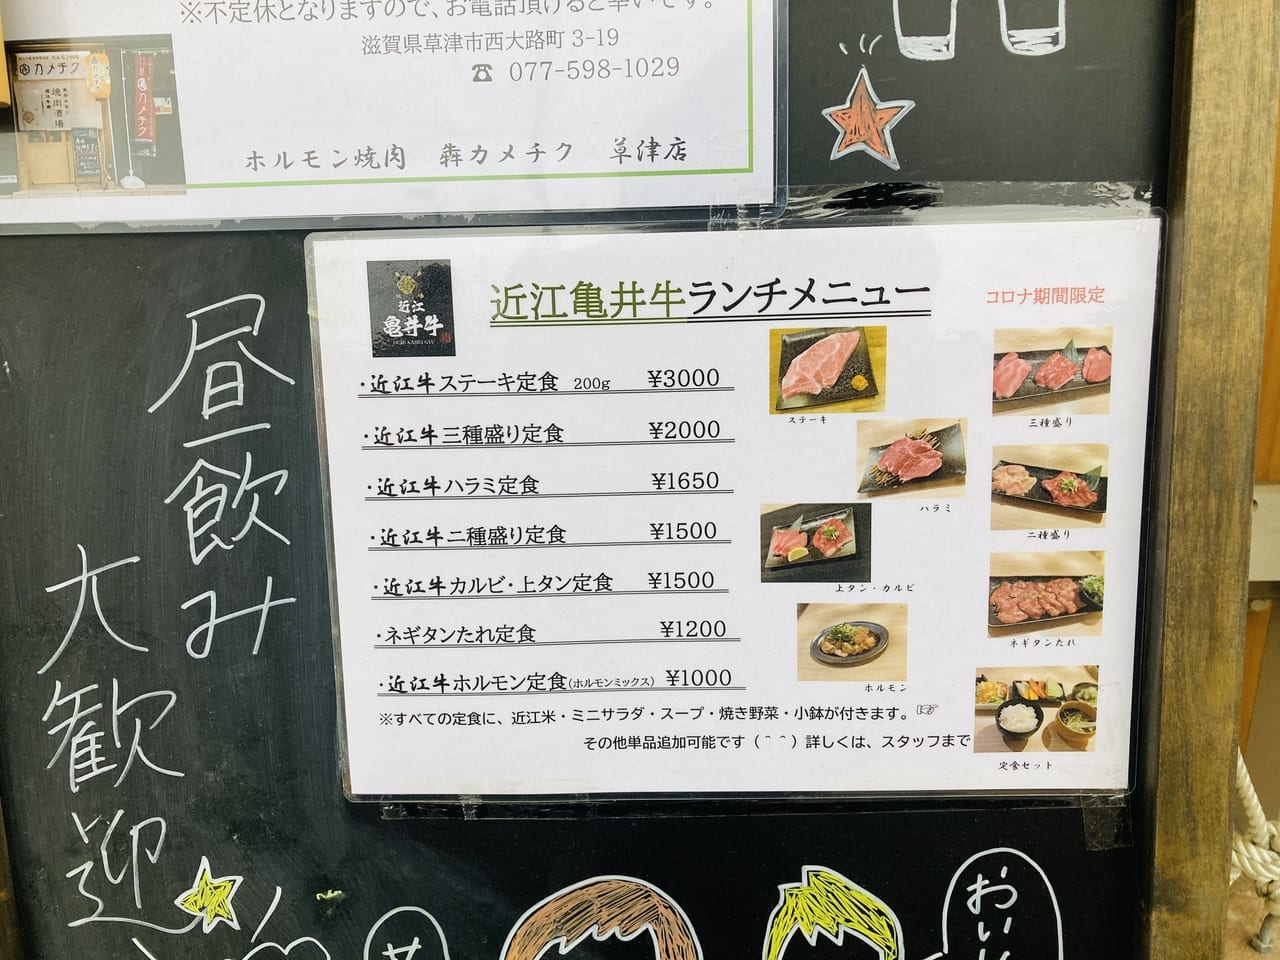 kamechiku menu